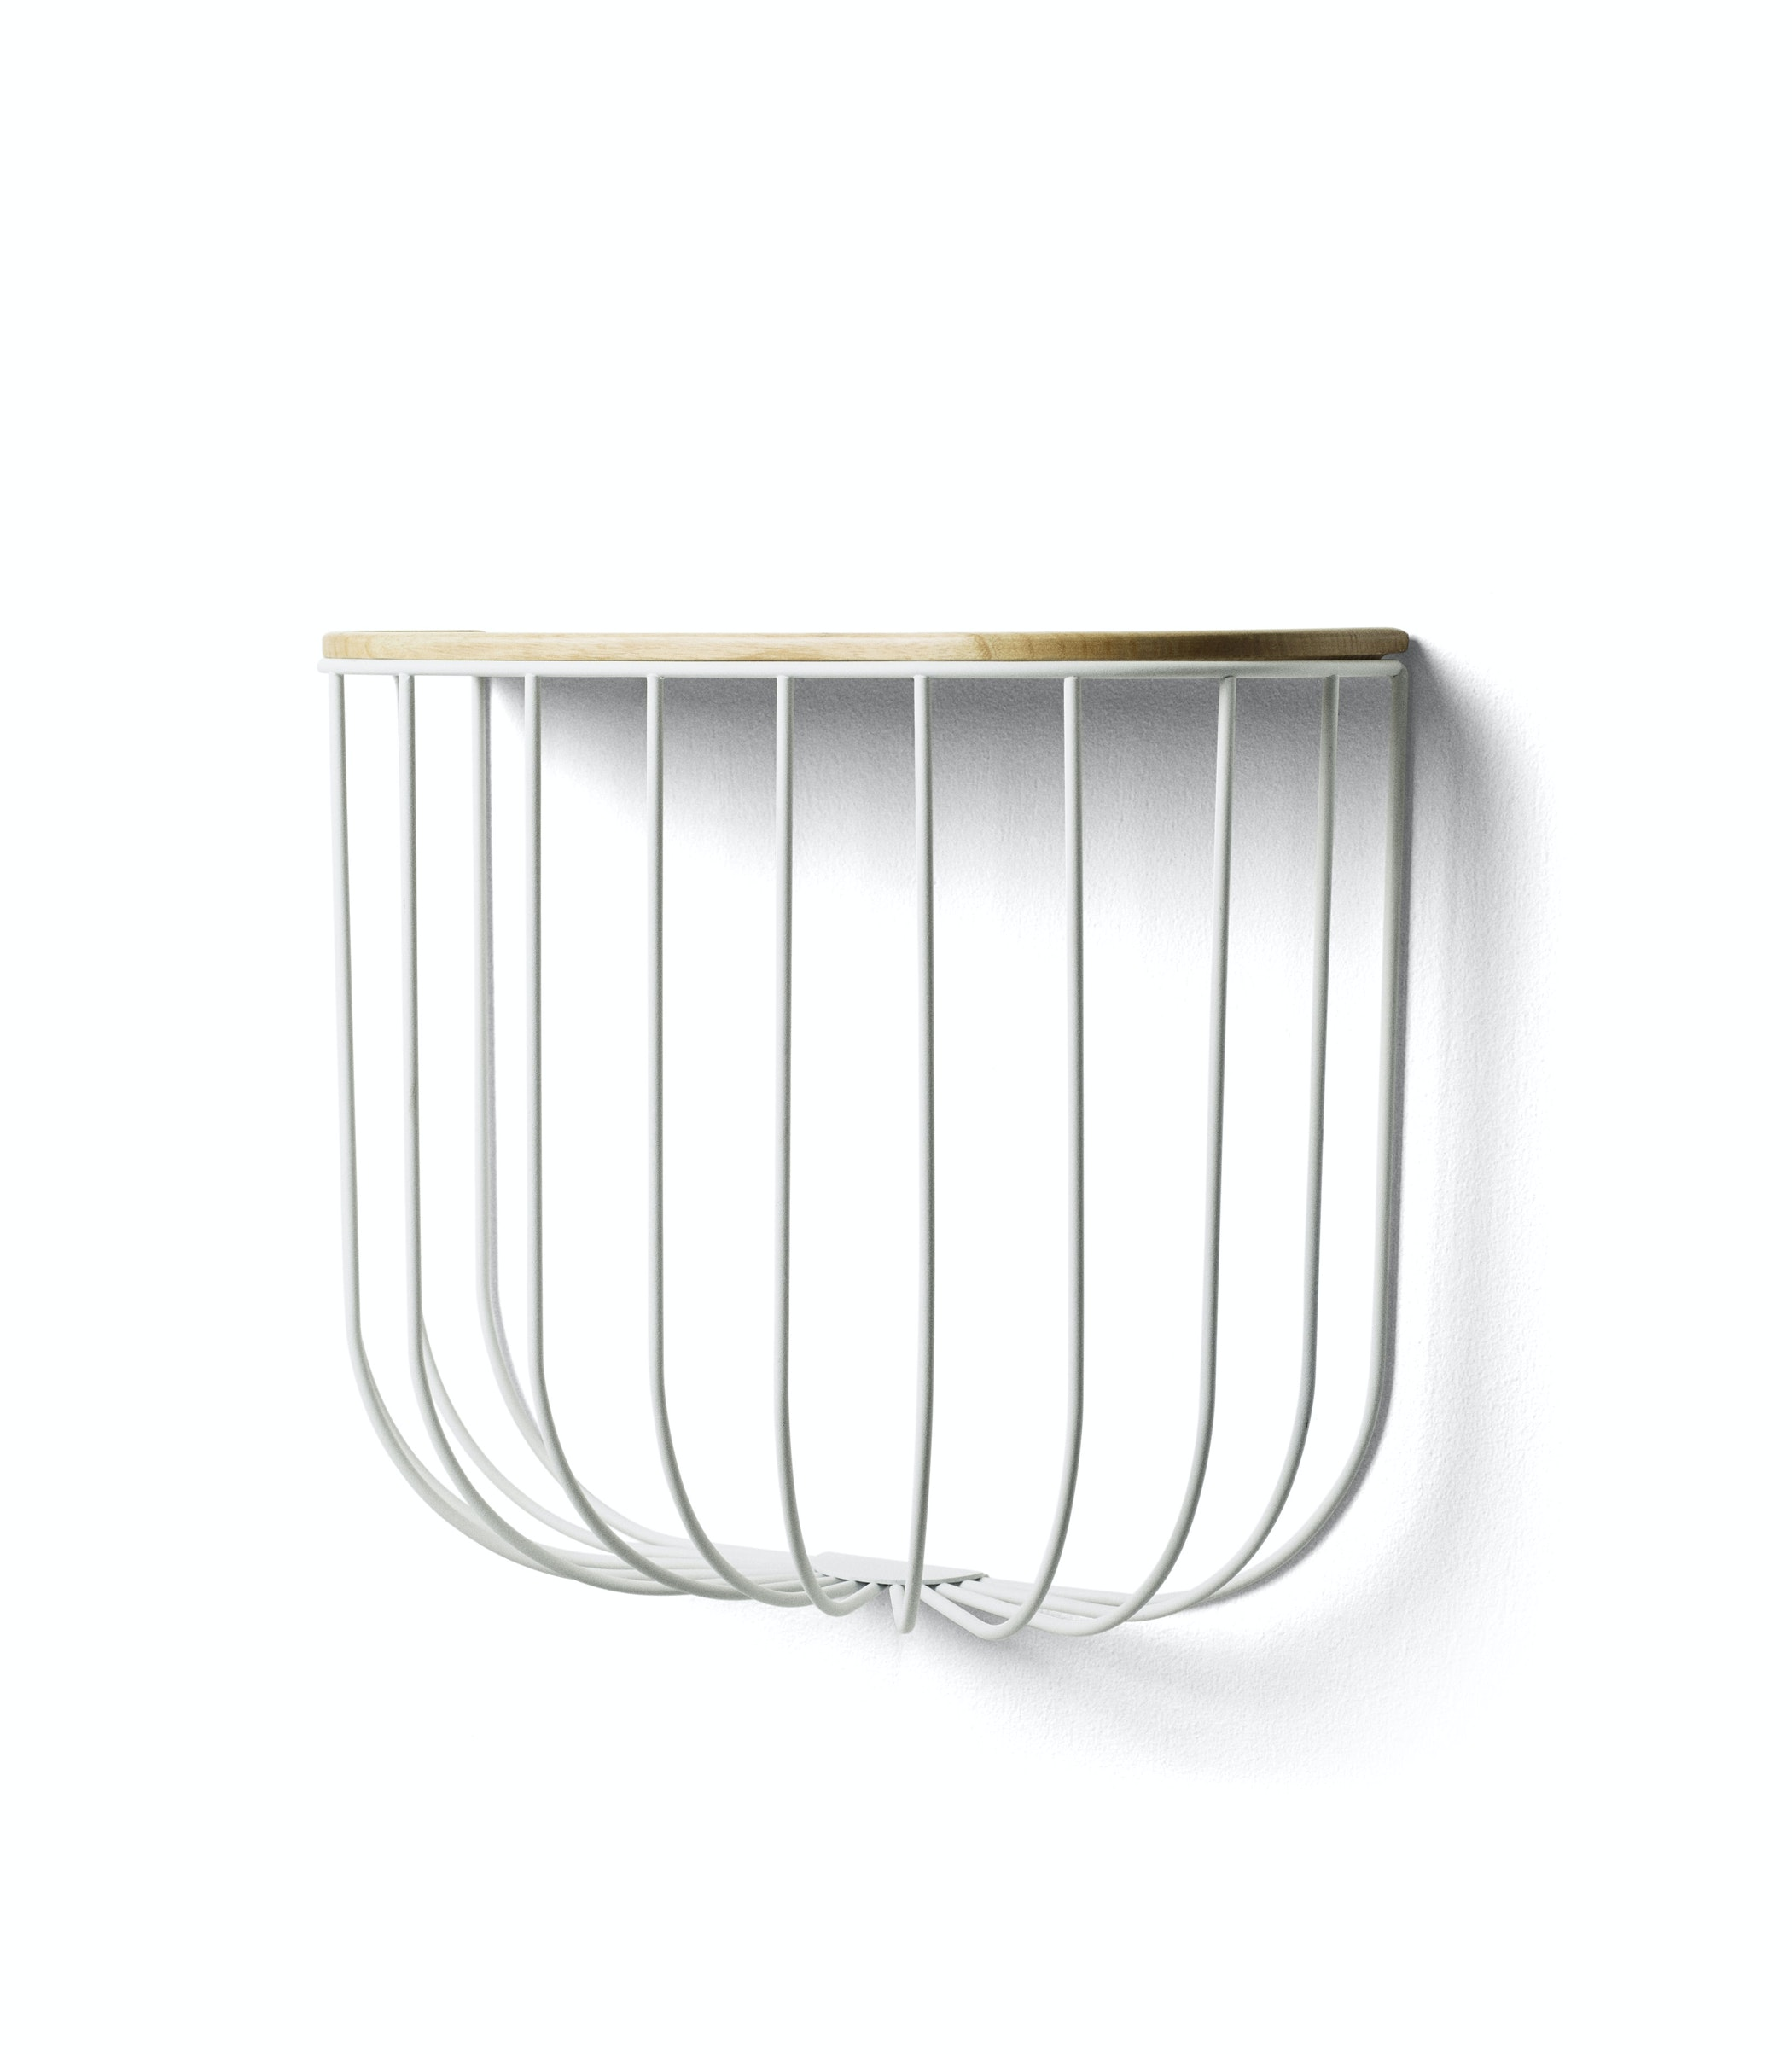 3520639 Fuwl Cage Shelf White 01 Download 72Dpi Jpg Rgb 290536